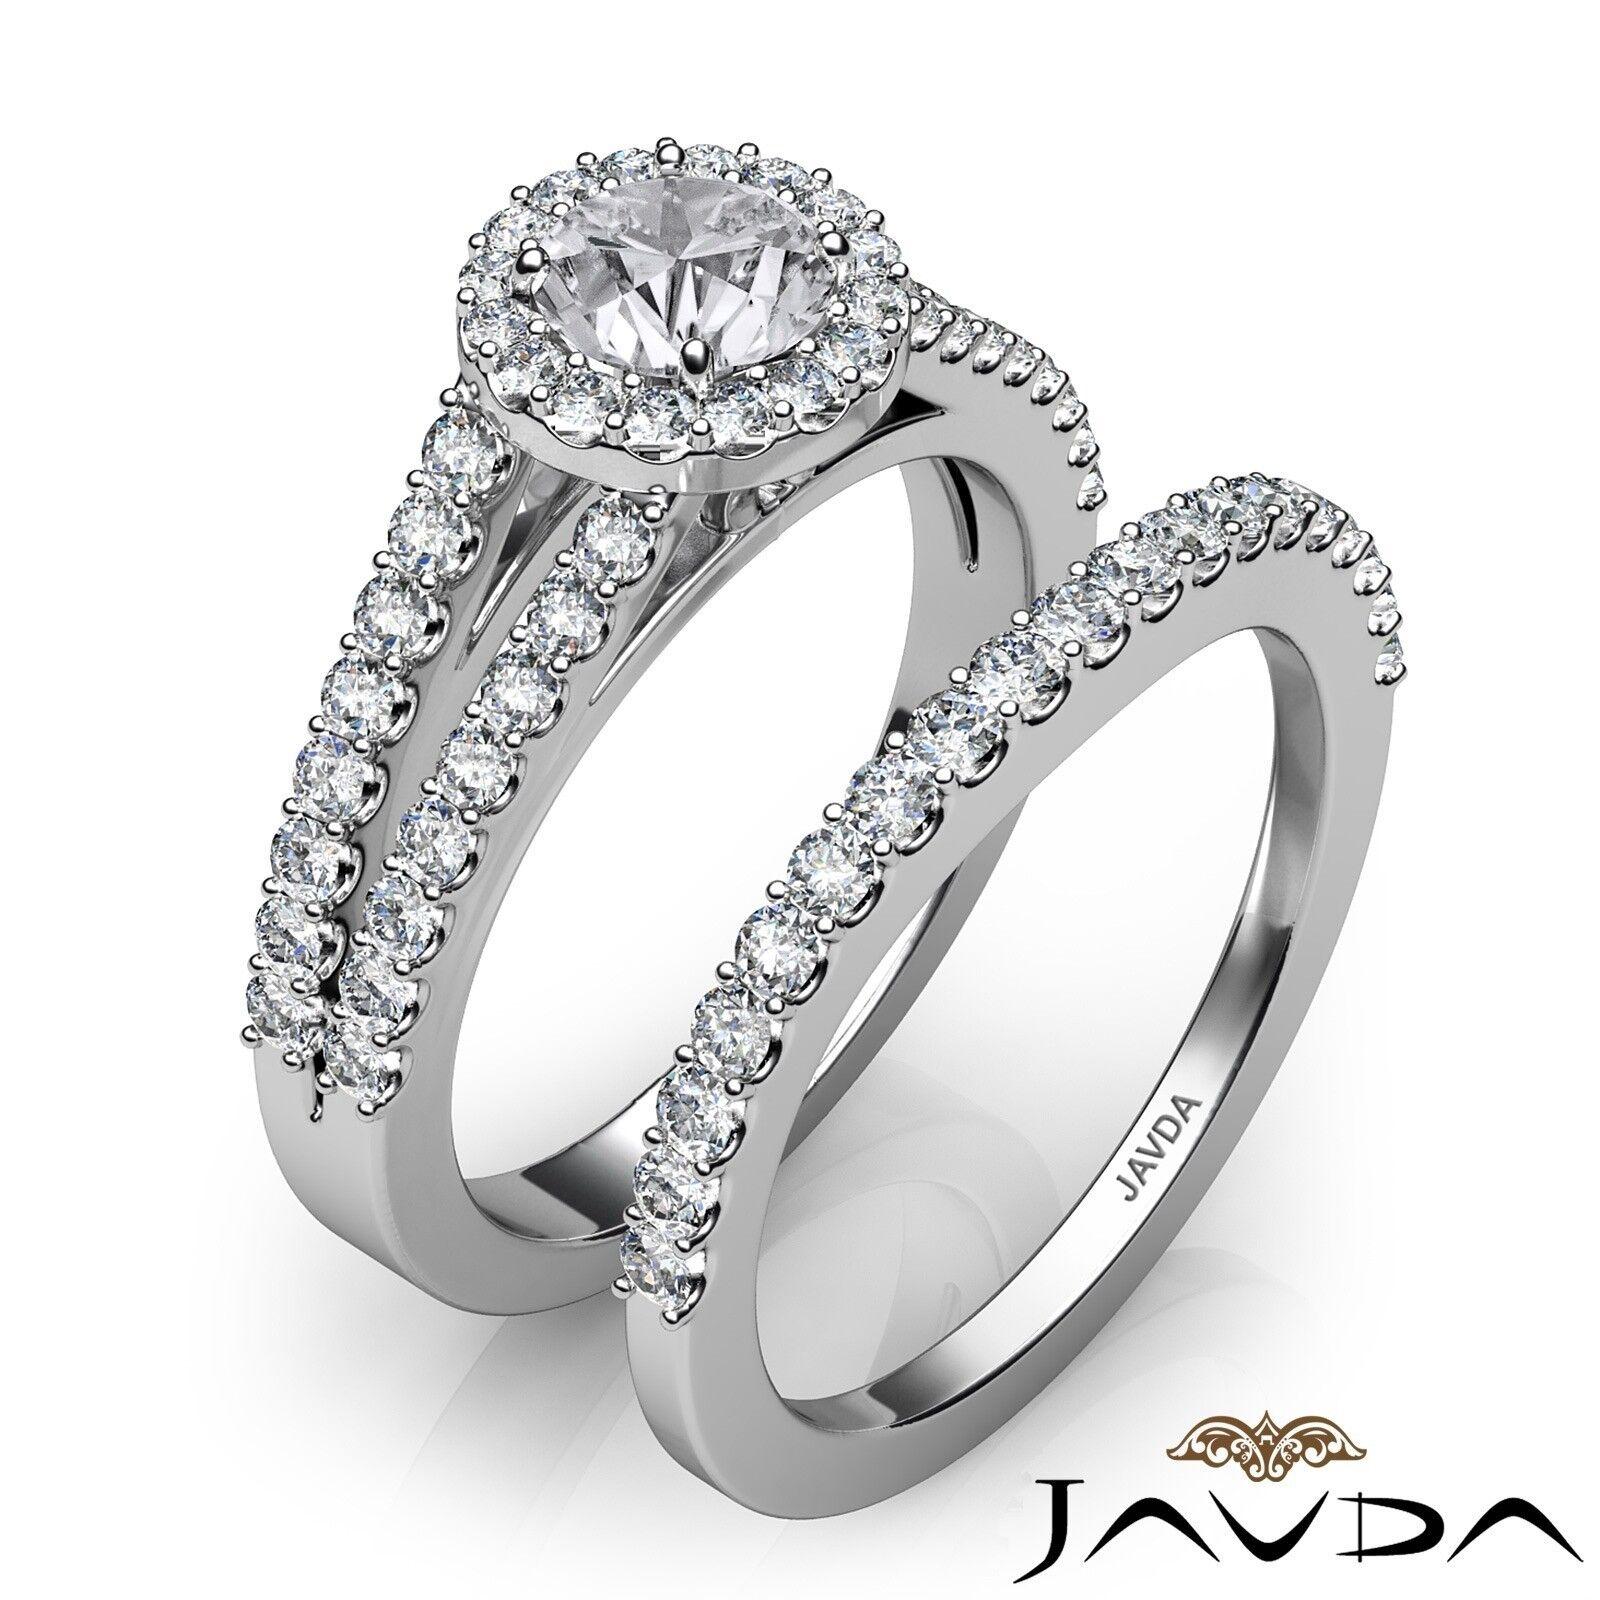 1.85ctw Luxurious Wedding Bridal Round Diamond Engagement Ring GIA G-VVS1 W Gold 2